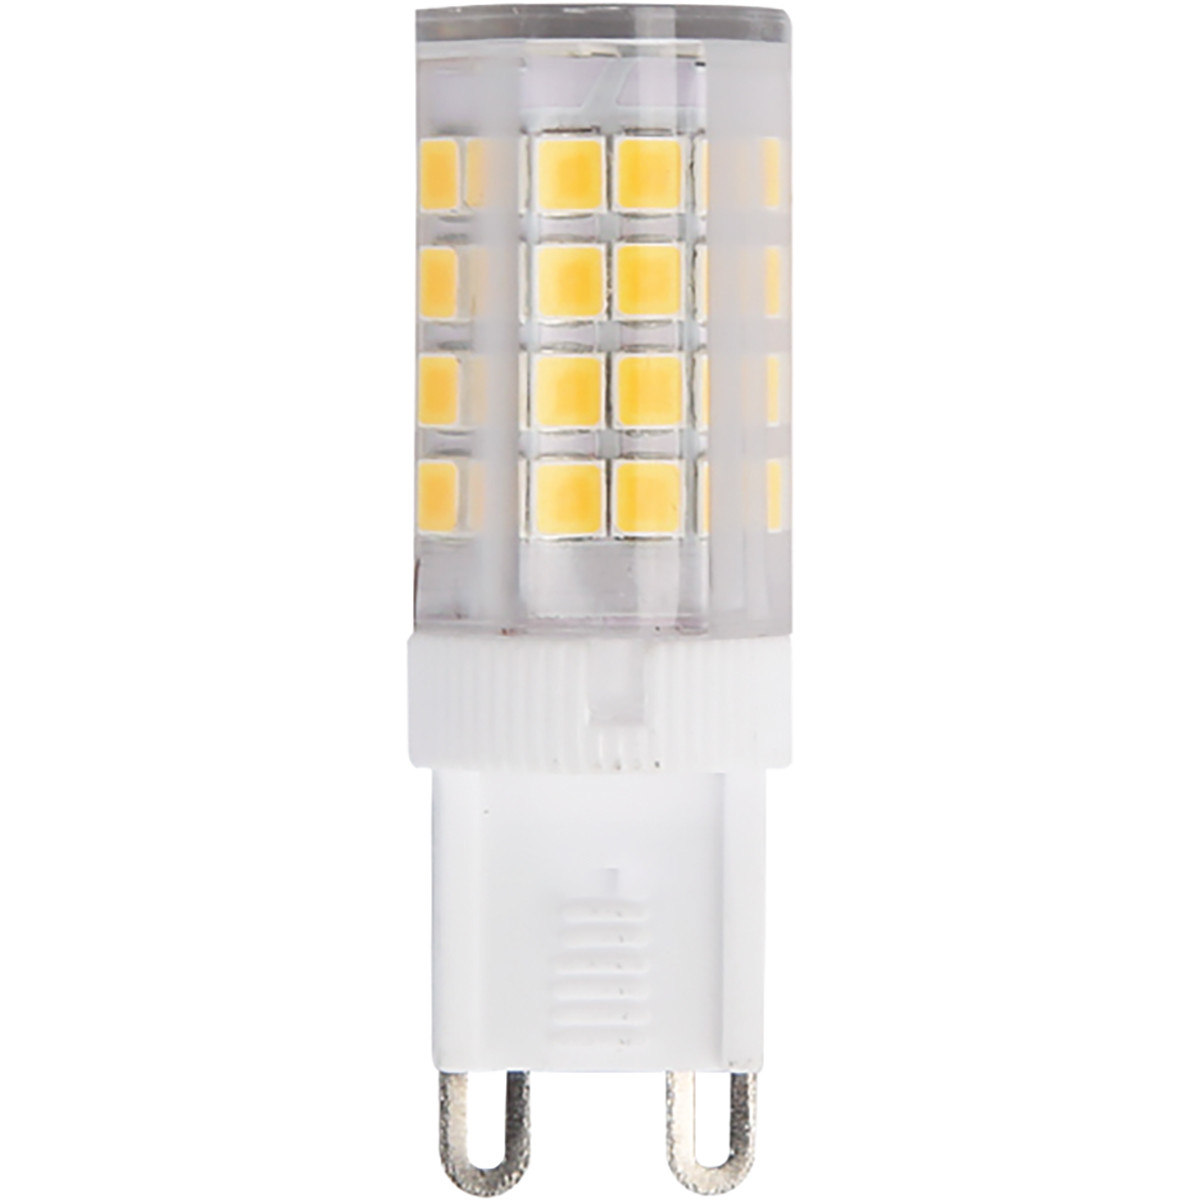 LED Lamp - Aigi - G9 Fitting - 3.5W - Helder/Koud Wit 6500K | Vervangt 30W